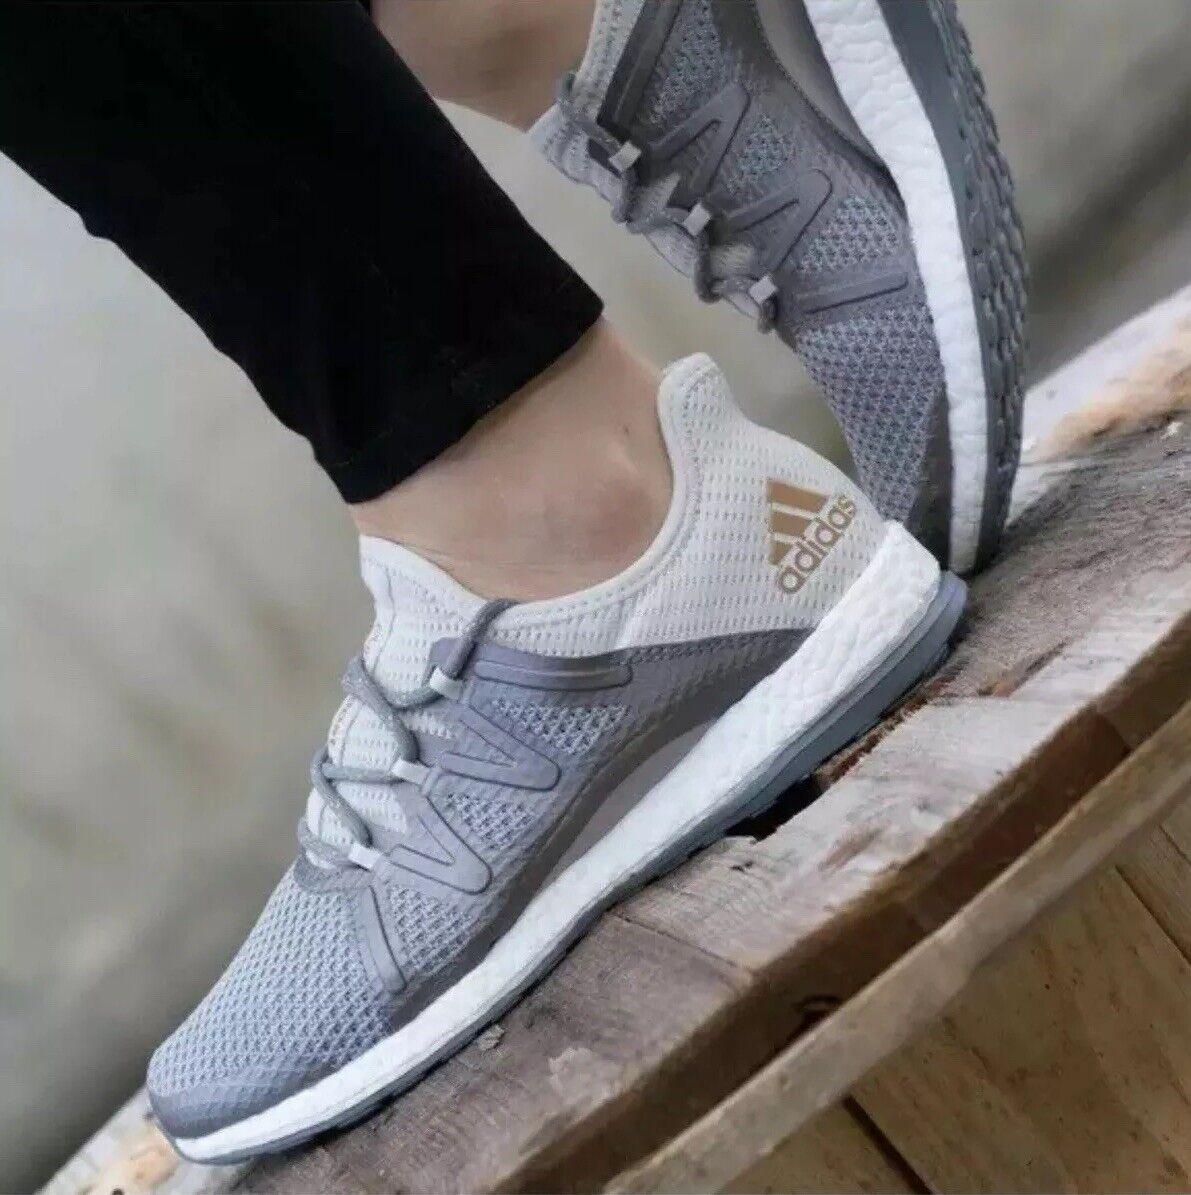 Adidas kvinnor Purepoost Xpose springaning skor grå    Tactile guld BA8271  autentisk kvalitet